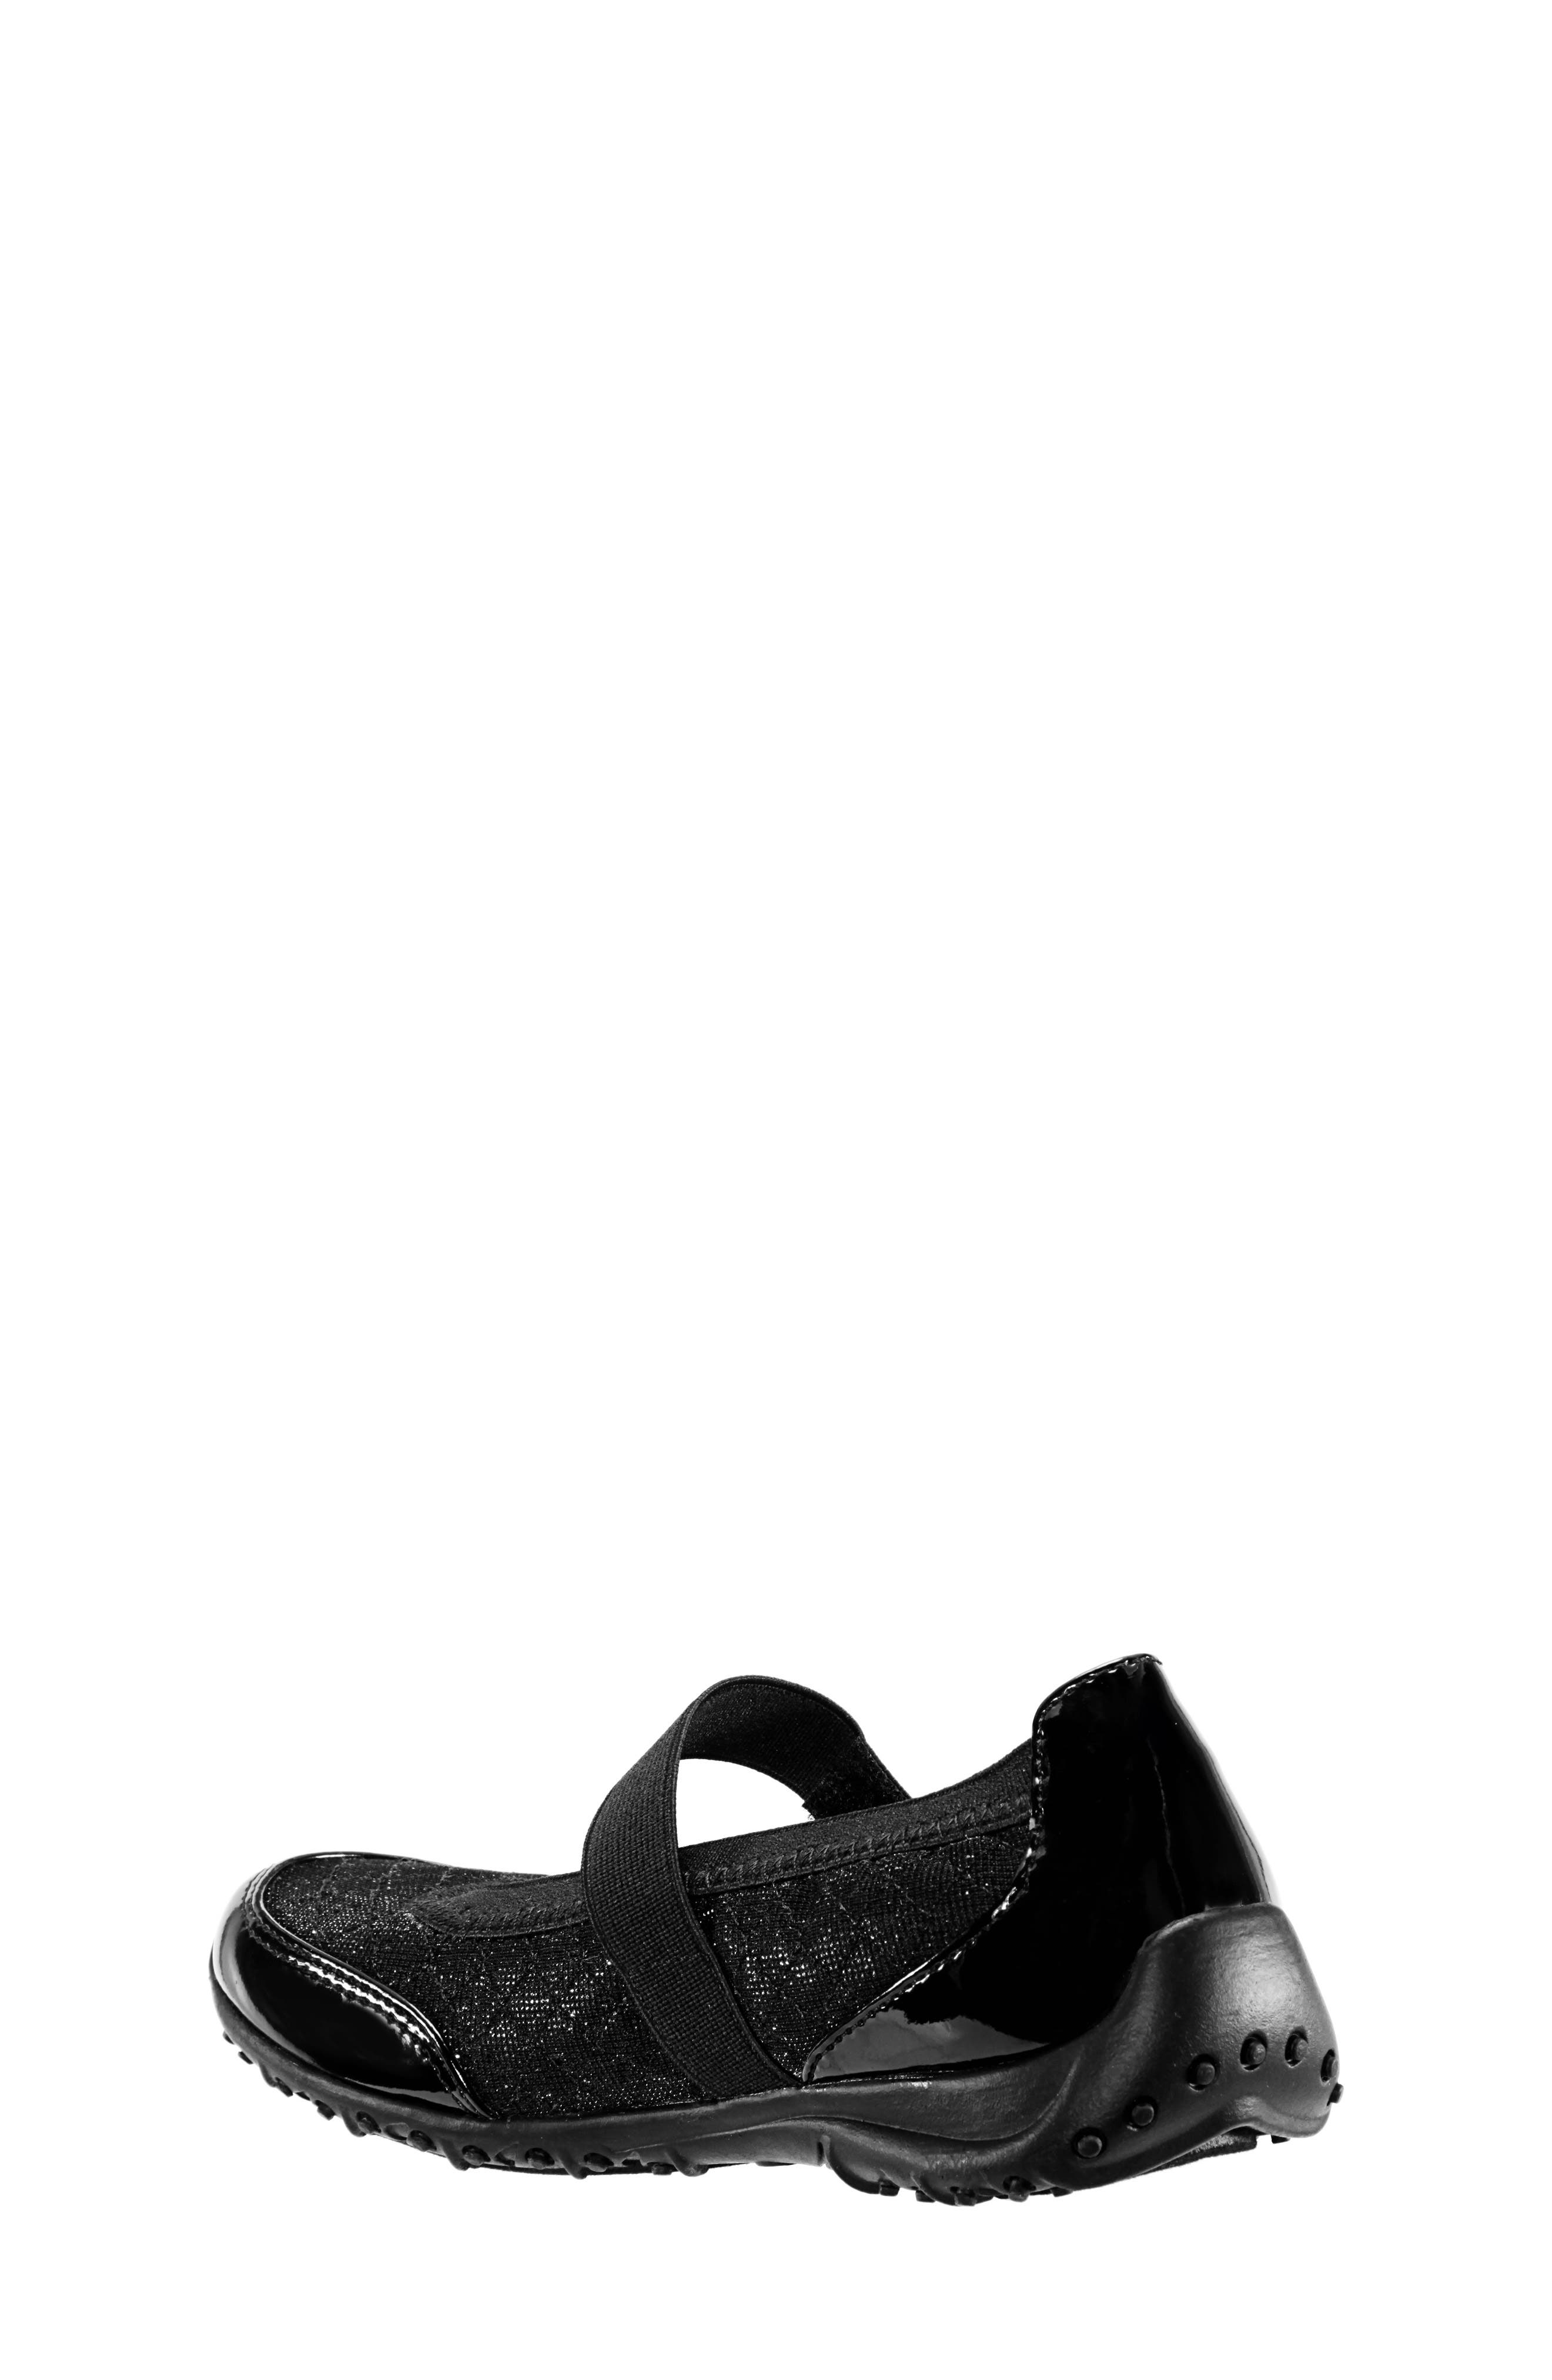 Ada Sparkle Mary Jane,                             Alternate thumbnail 2, color,                             BLACK/ SPARKLE FAB/ PATENT